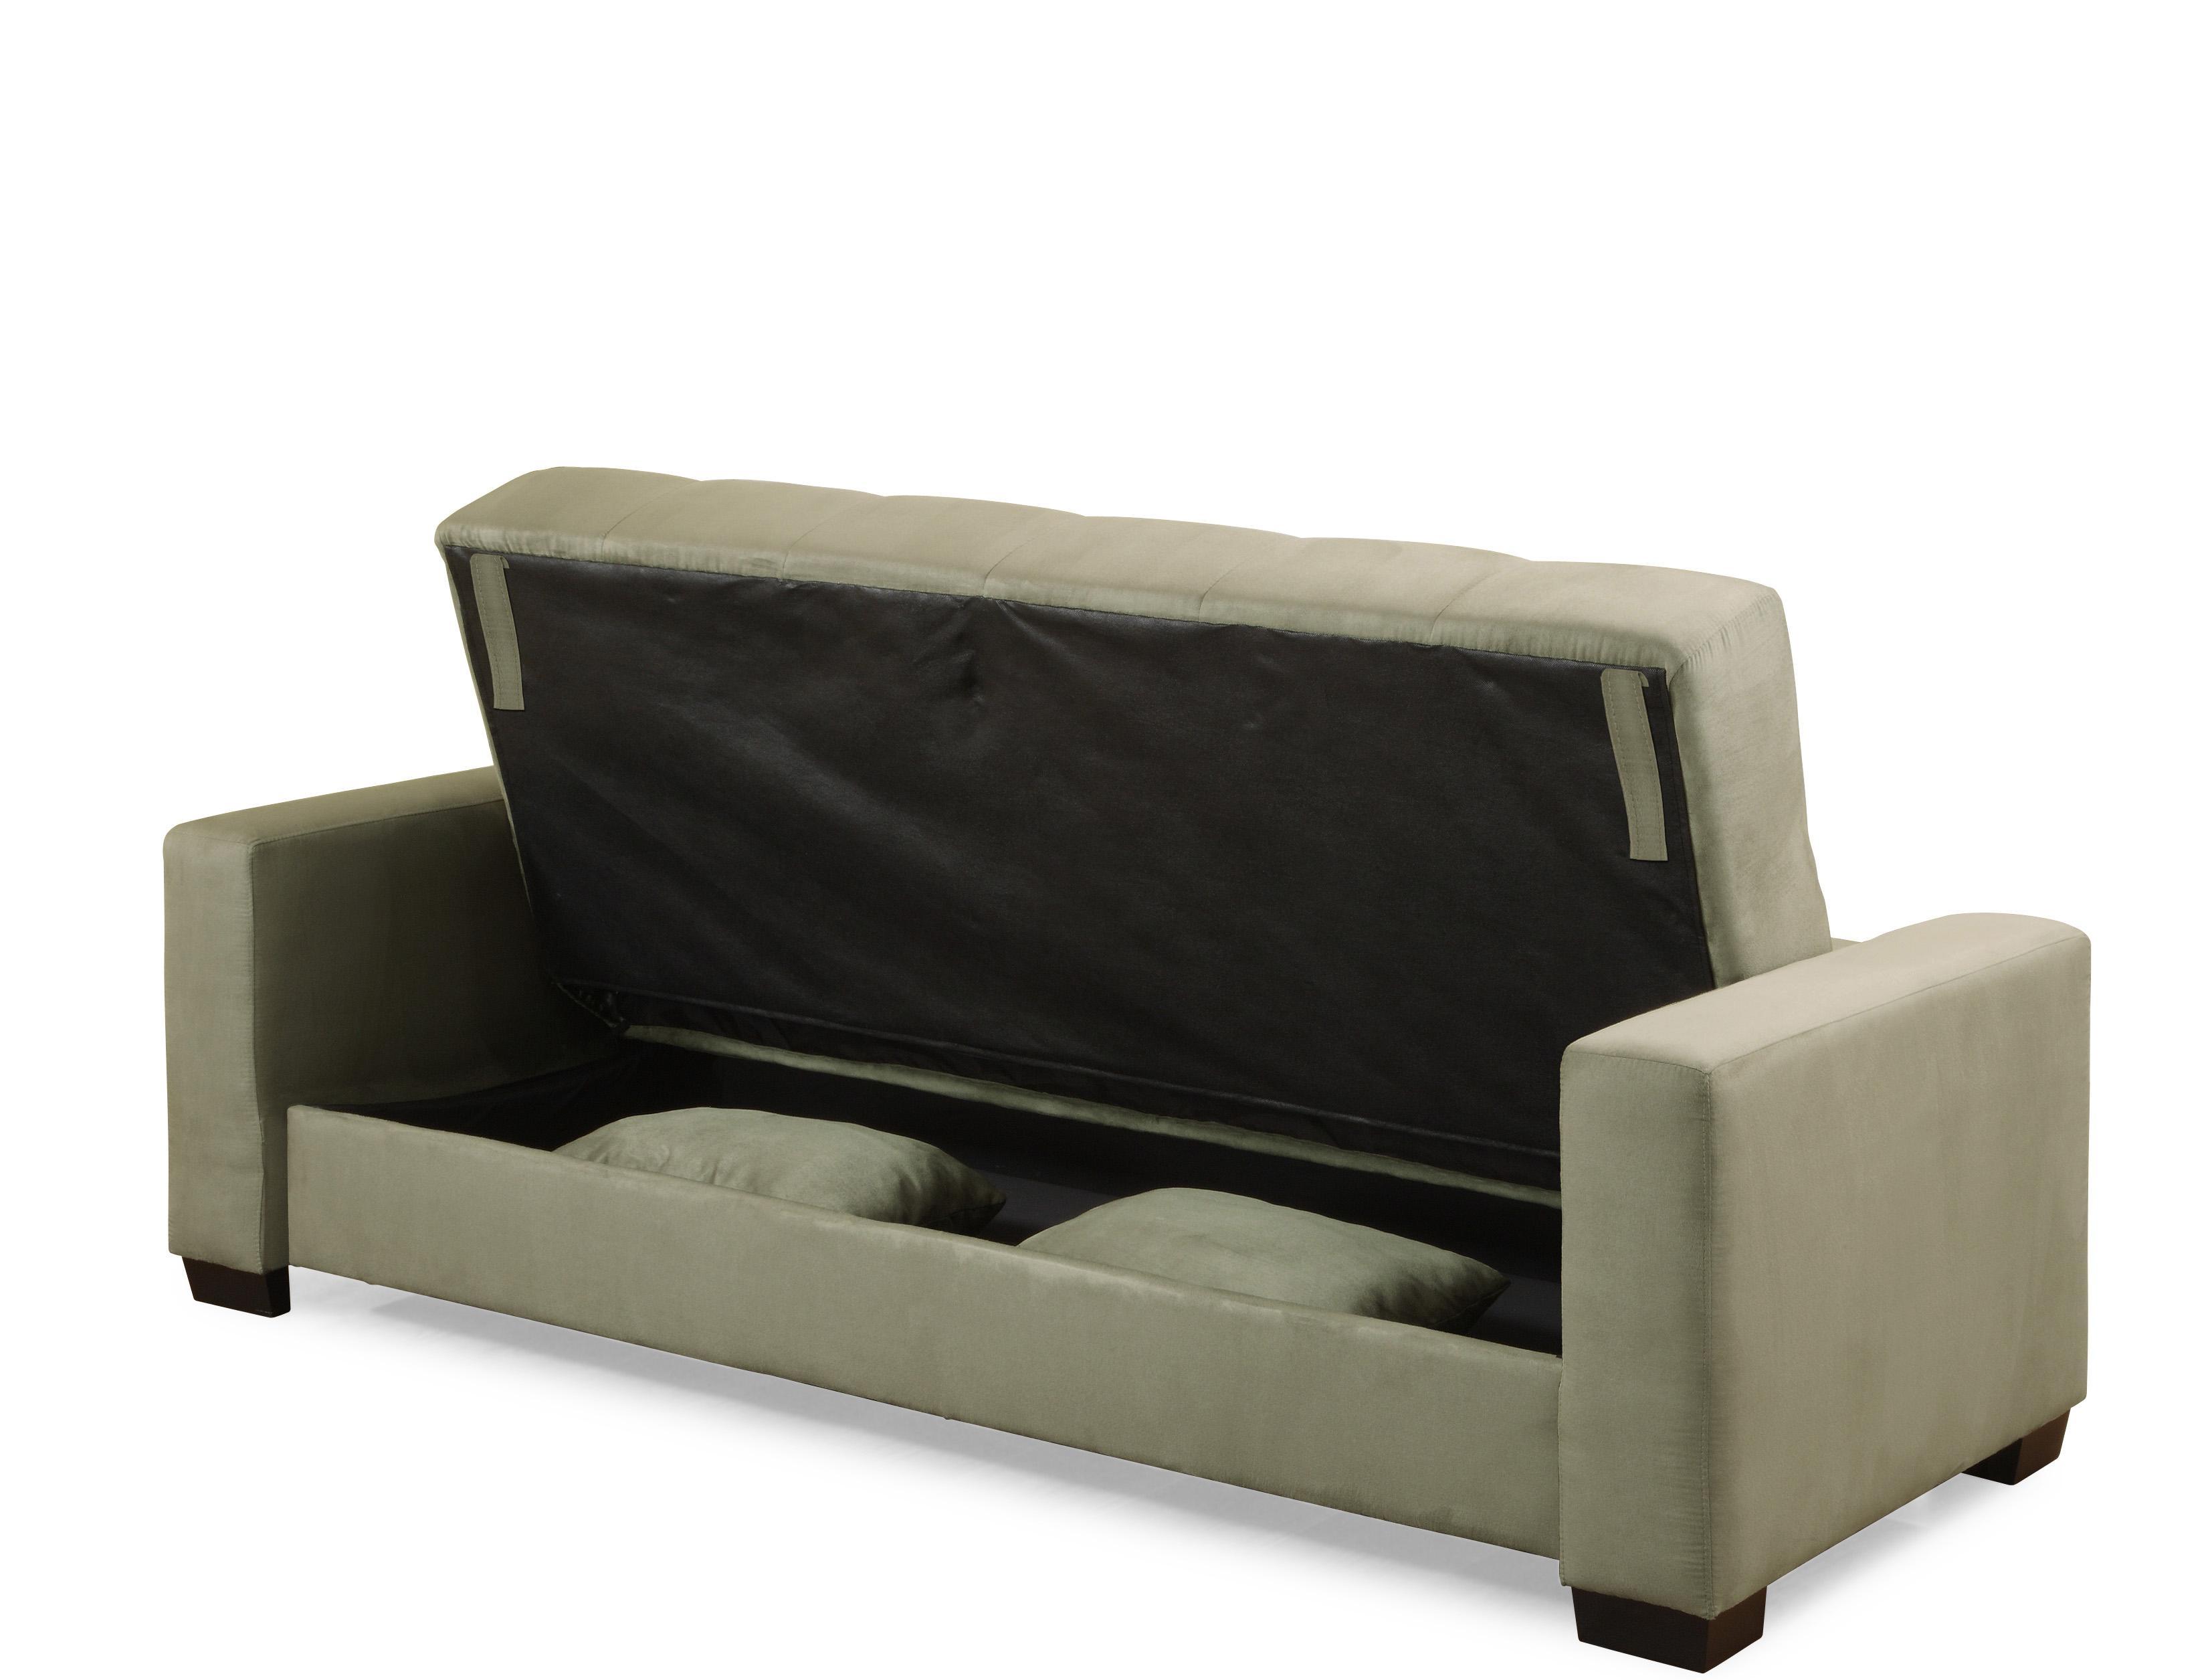 Folding Grey Fabric Sofa Bed With Storage Having Rectangular Arm Inside Short Sofas (Image 6 of 20)